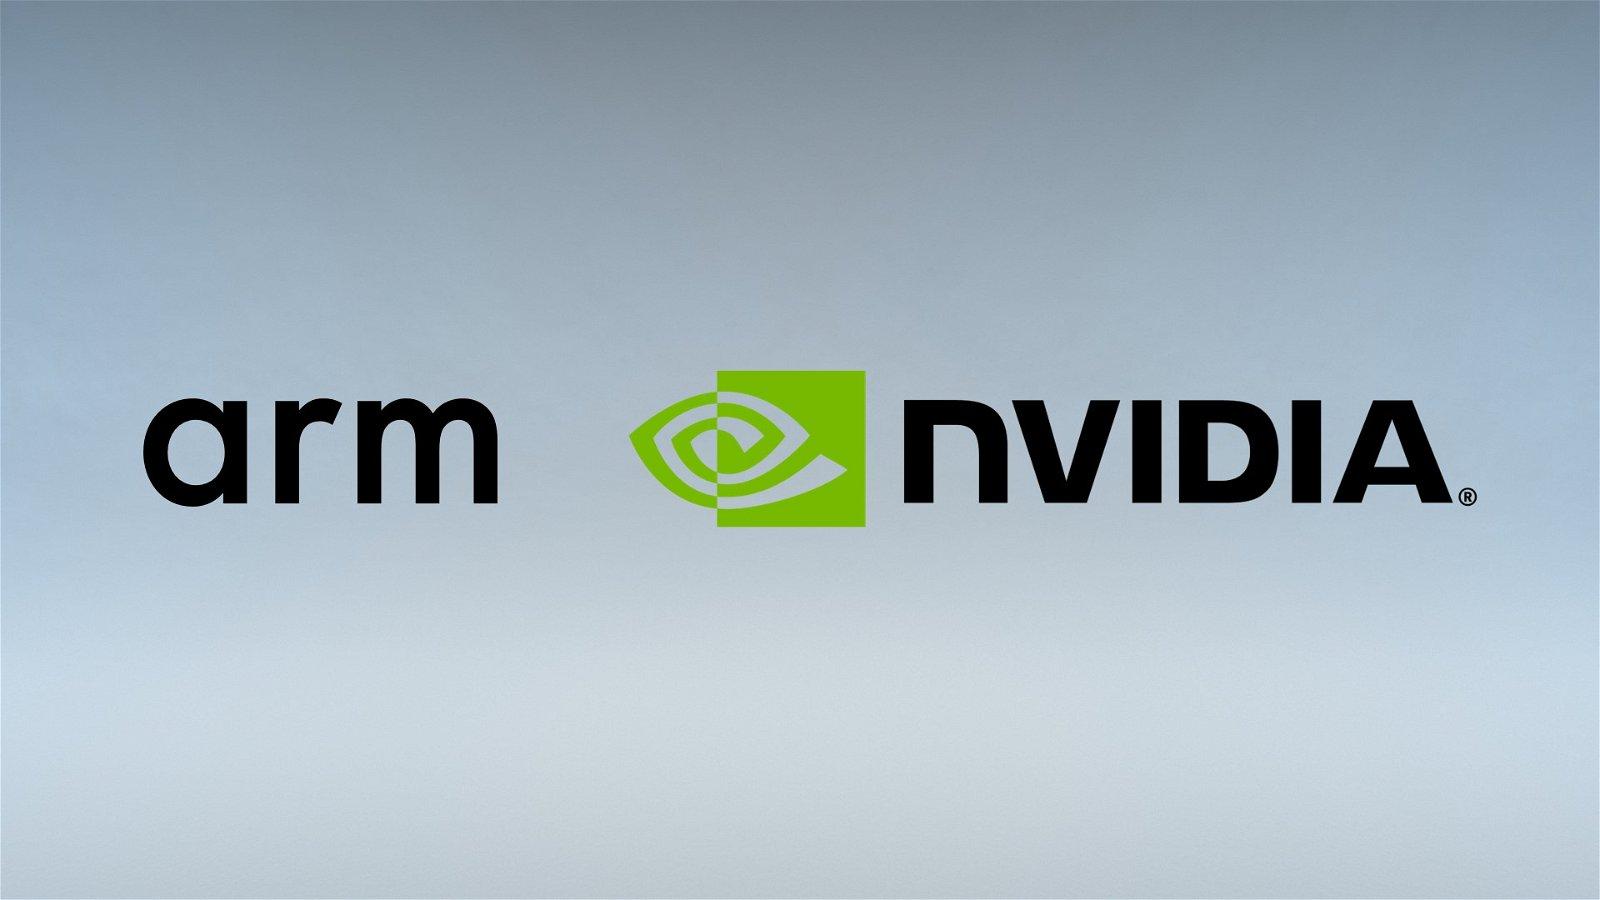 NVIDIA to Acquire Arm for $40 Billion 2